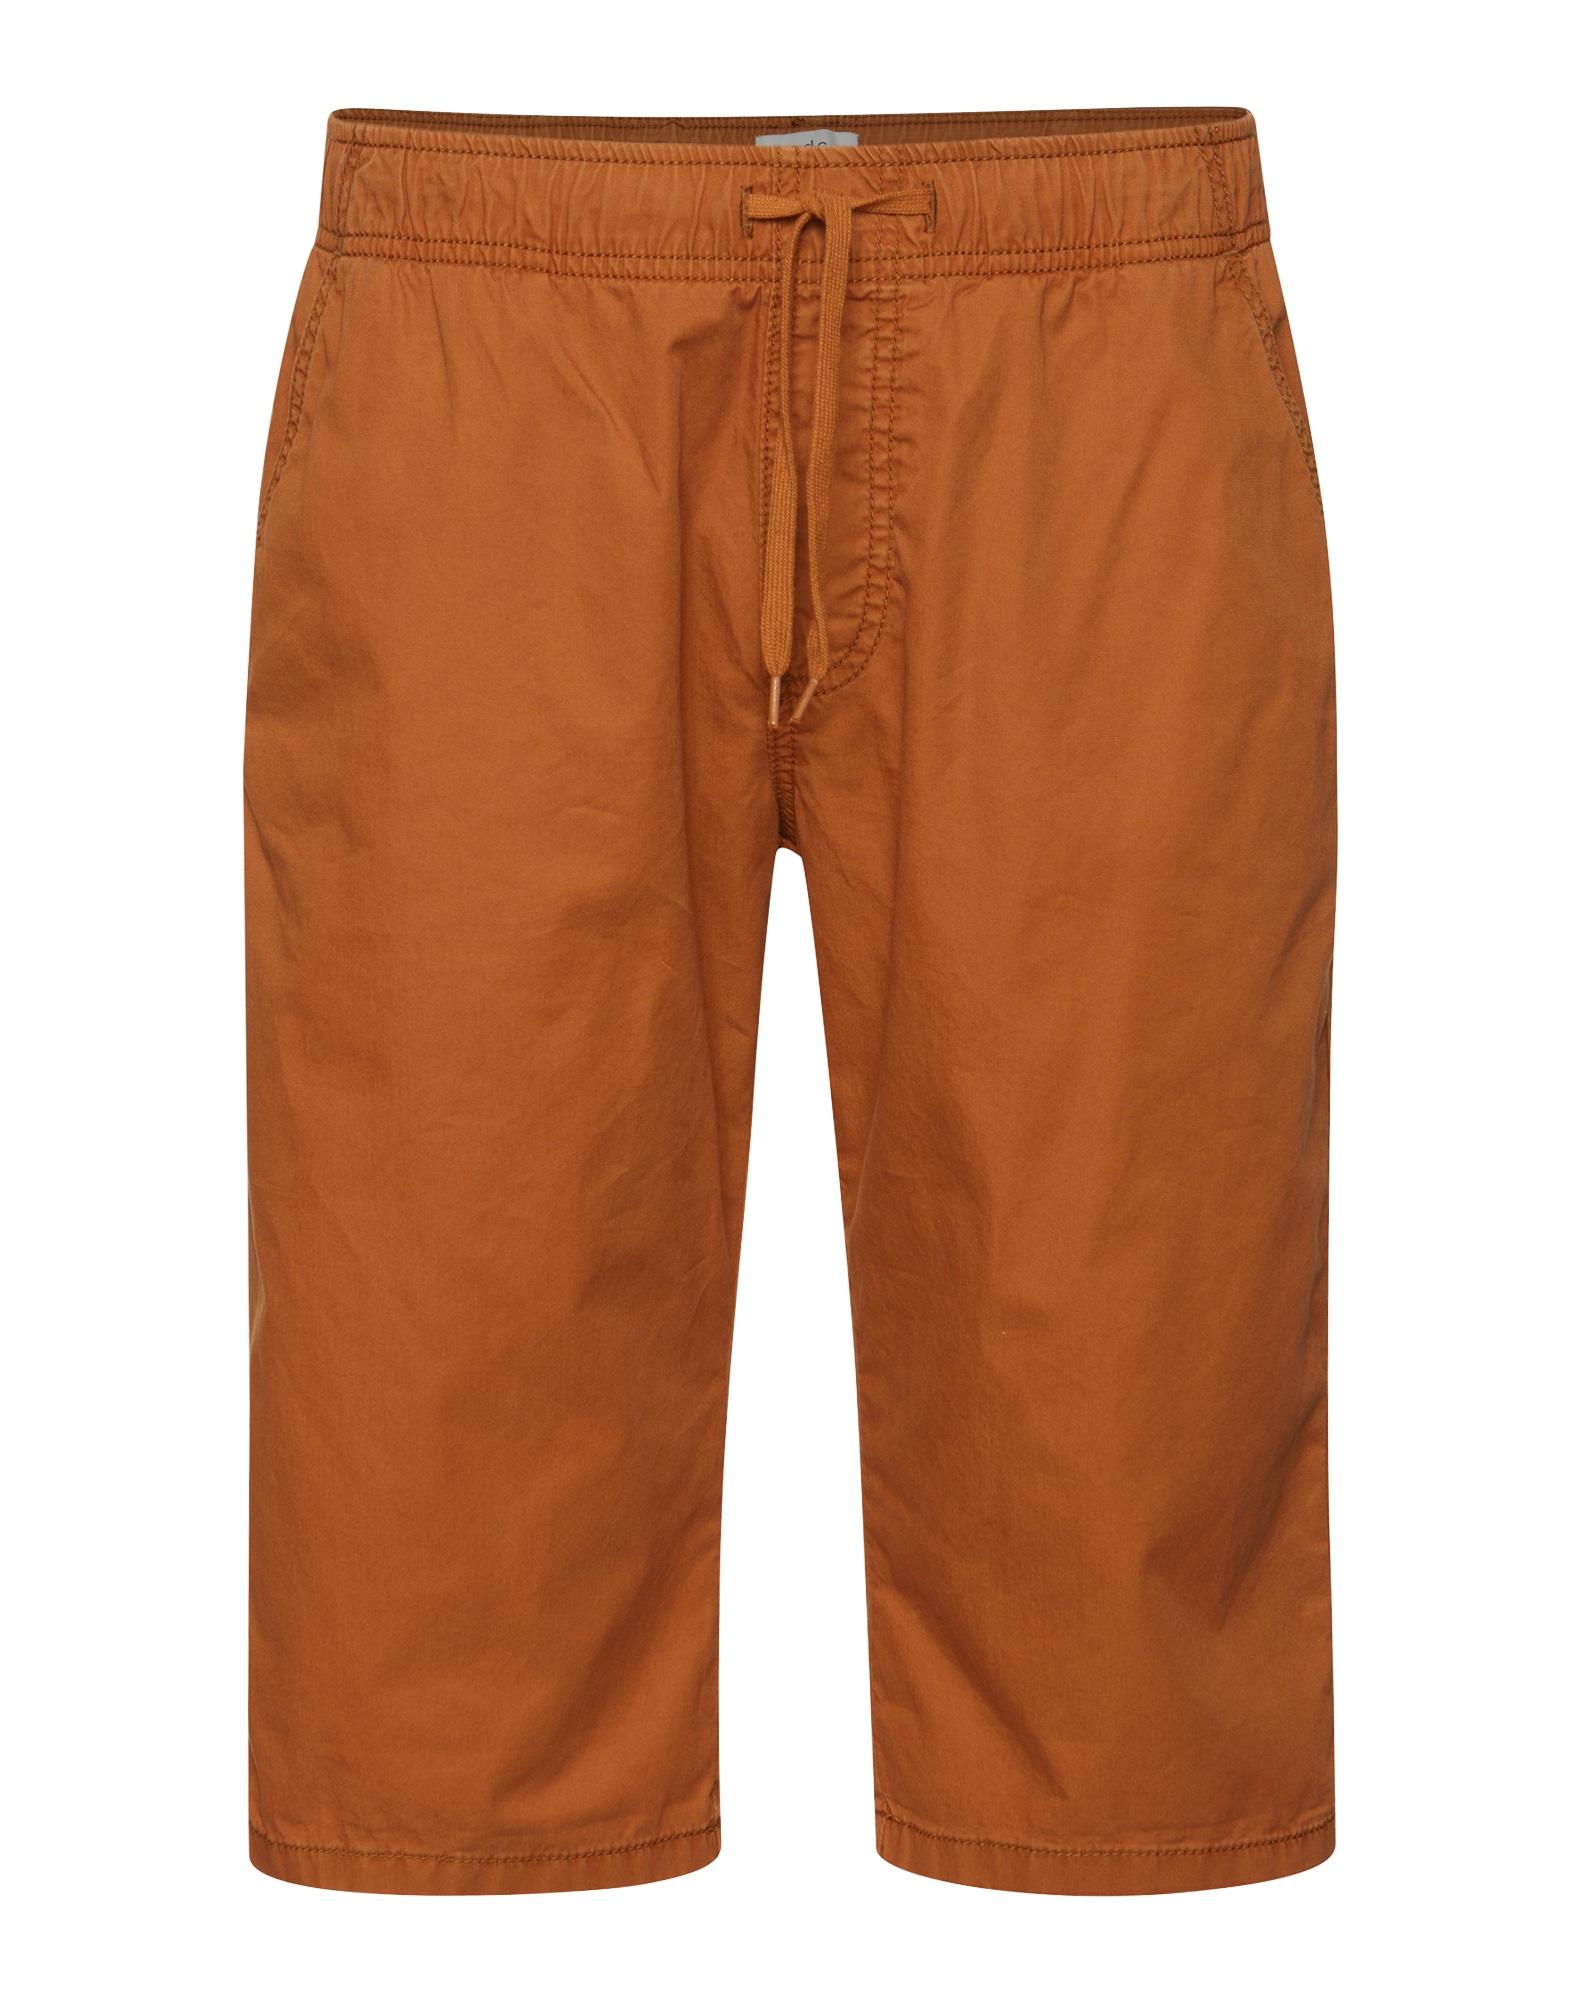 Shorts ´Elastic WB berm´